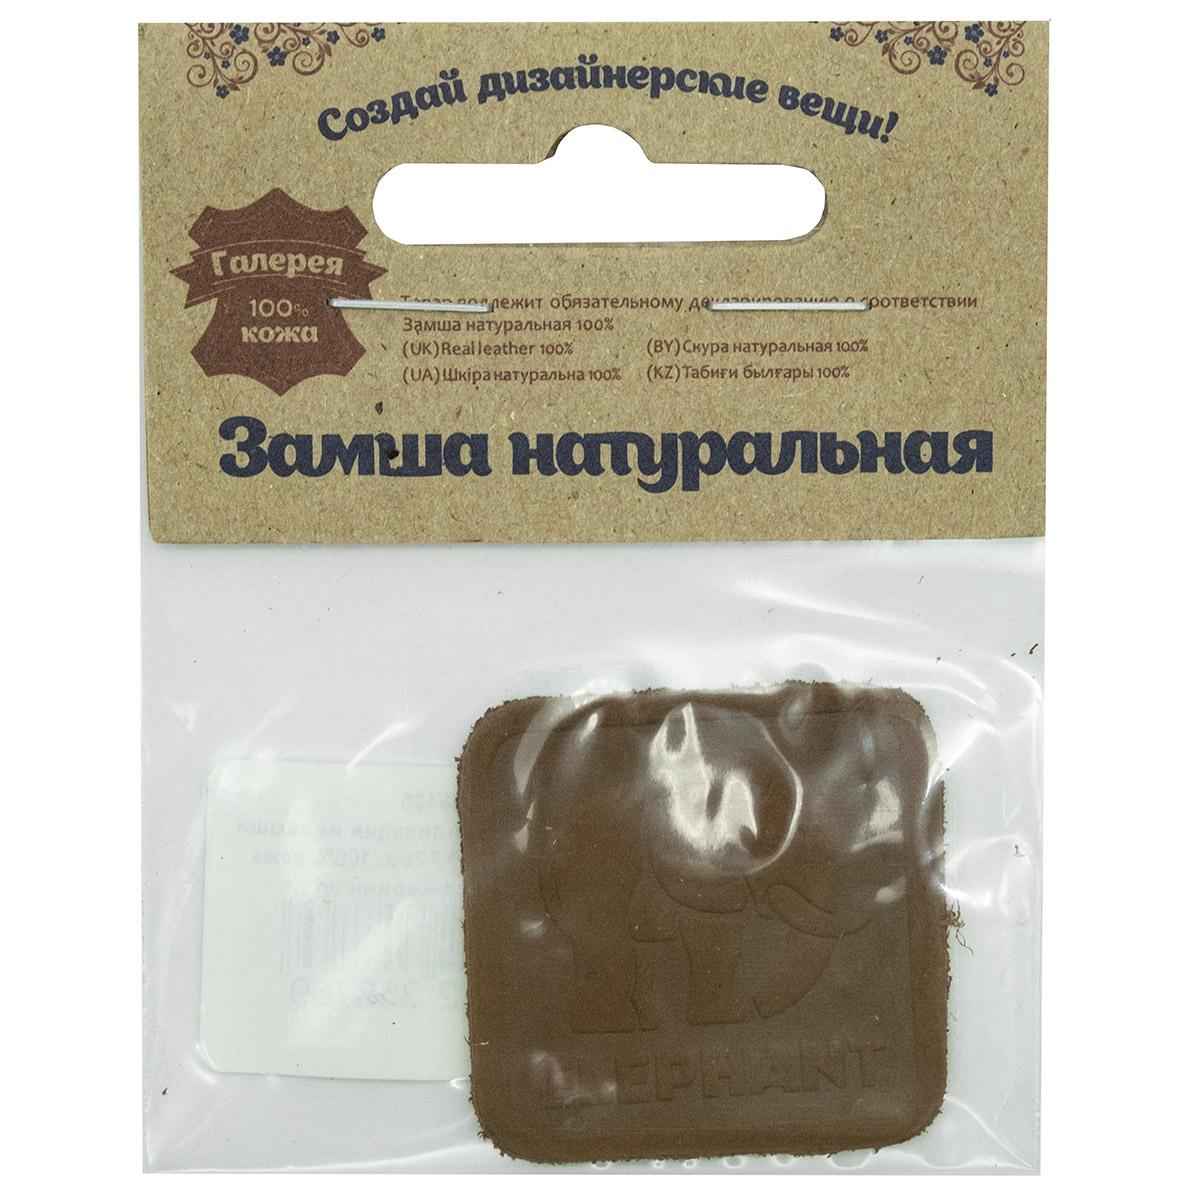 5003 Термоаппликация из замши Elephant 3,69*3,72см, 100% кожа